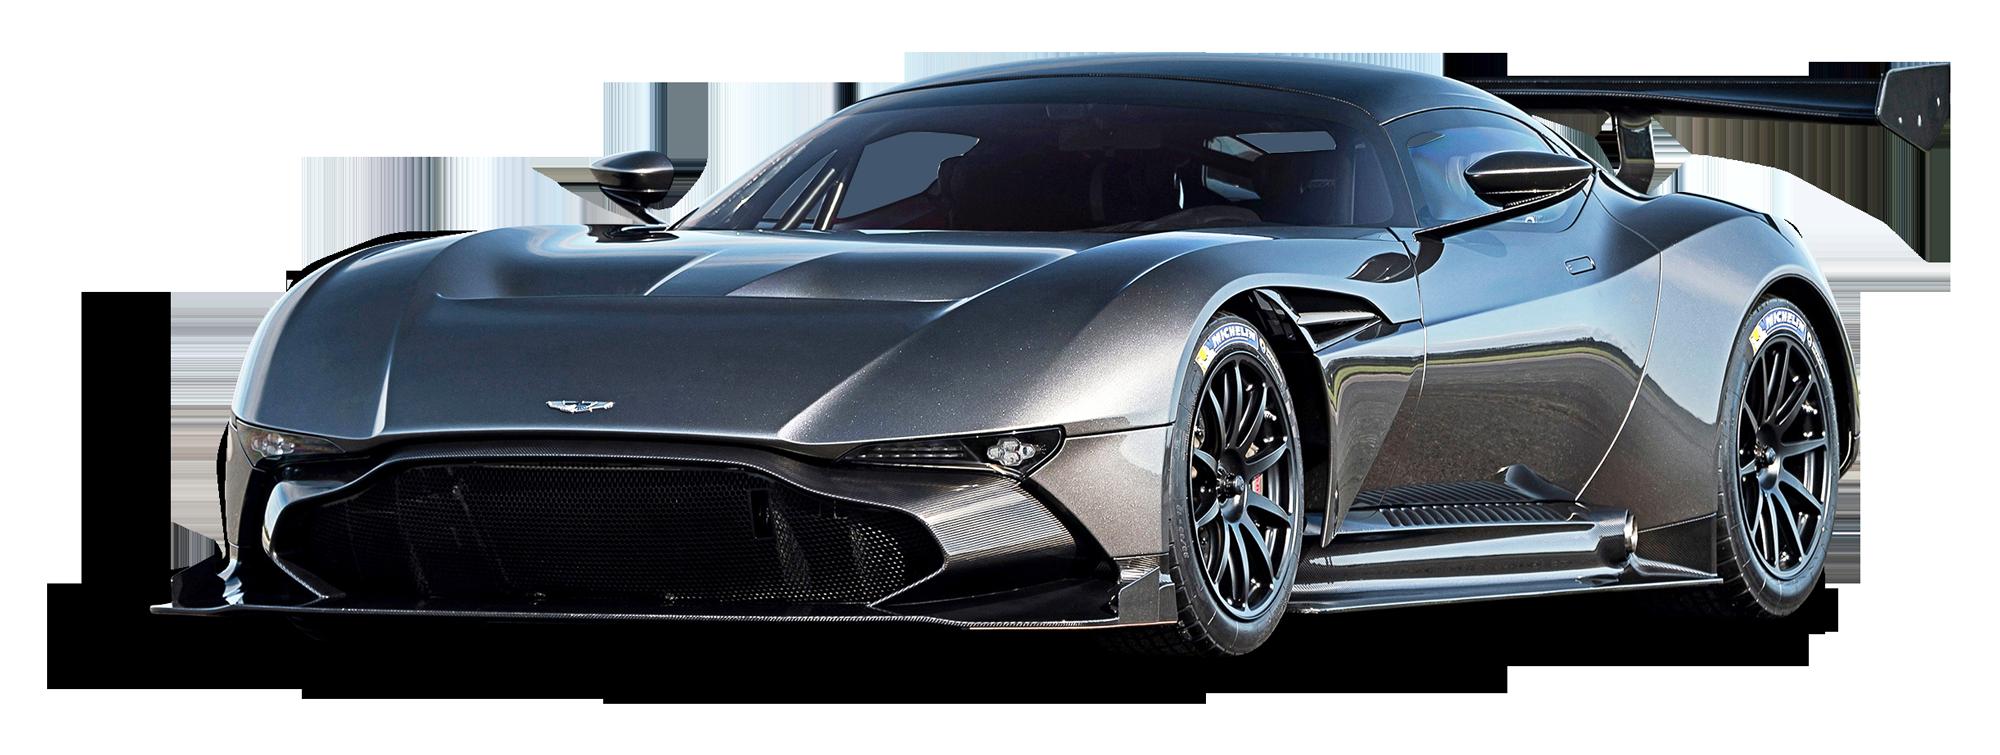 Aston Martin Vulcan Sports Car PNG Image   PurePNG | Free Transparent CC0  PNG Image Library